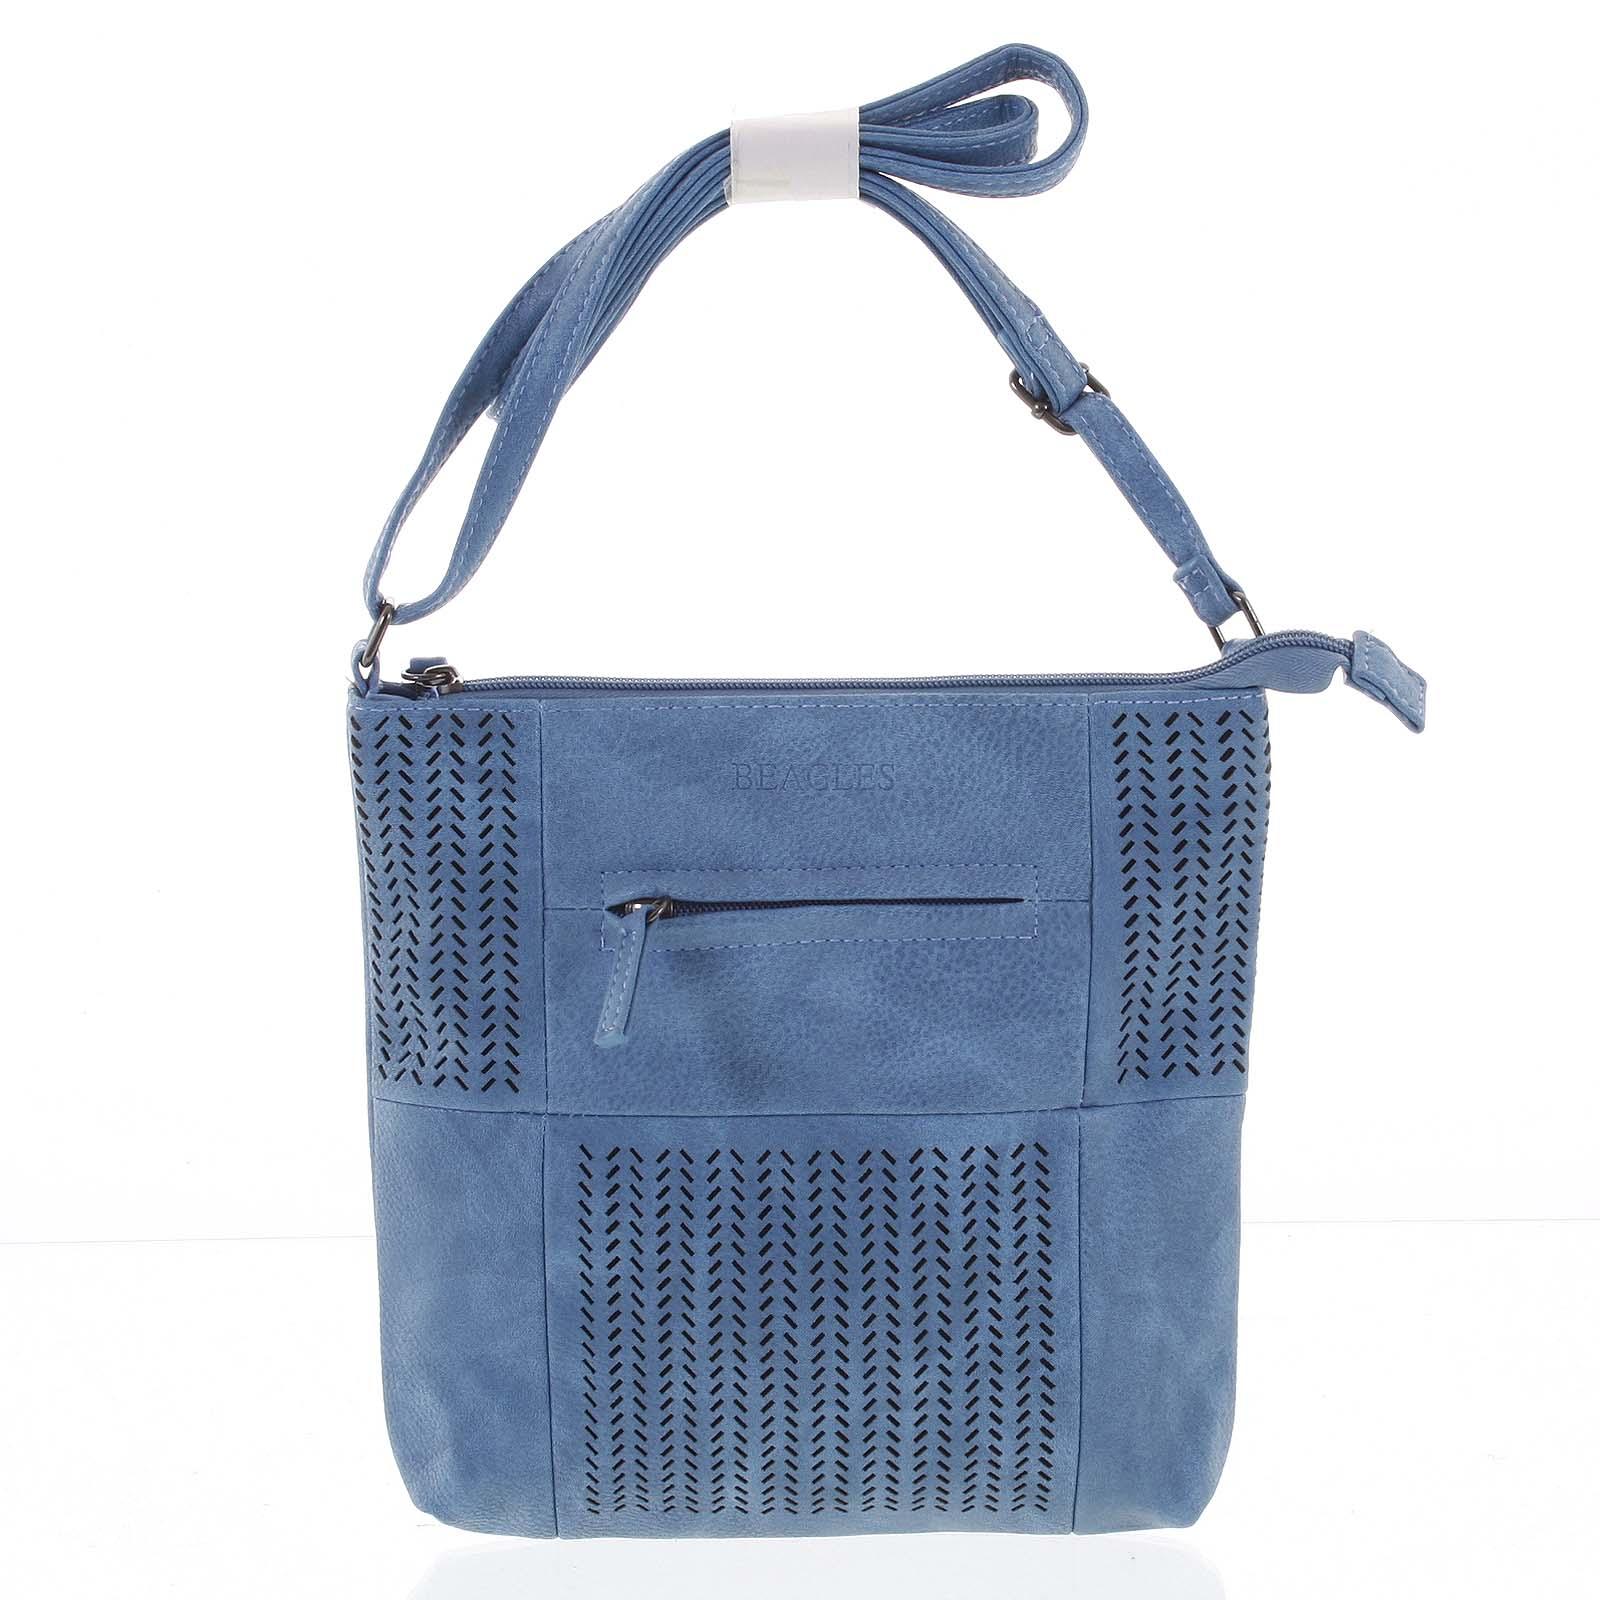 Malá elegantná perforovaná crossbody kabelka modrá - Beagles Soraya